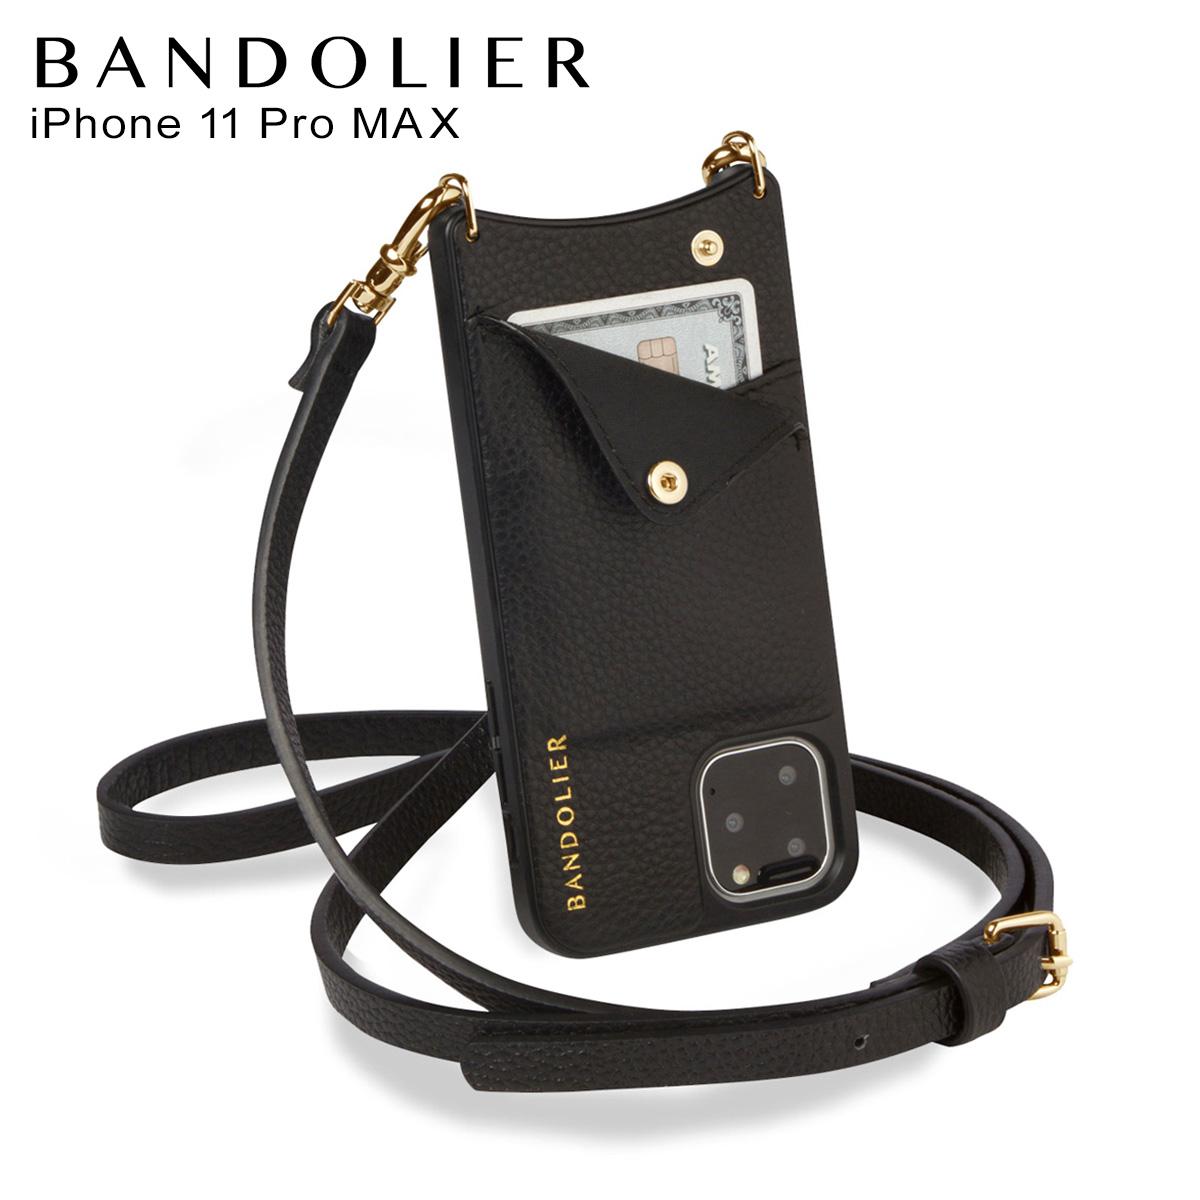 BANDOLIER EMMA GOLD バンドリヤー エマ ゴールド iPhone11 Pro MAX ケース スマホ 携帯 ショルダー アイフォン メンズ レディース ブラック 黒 2900 [12月上旬 新入荷]